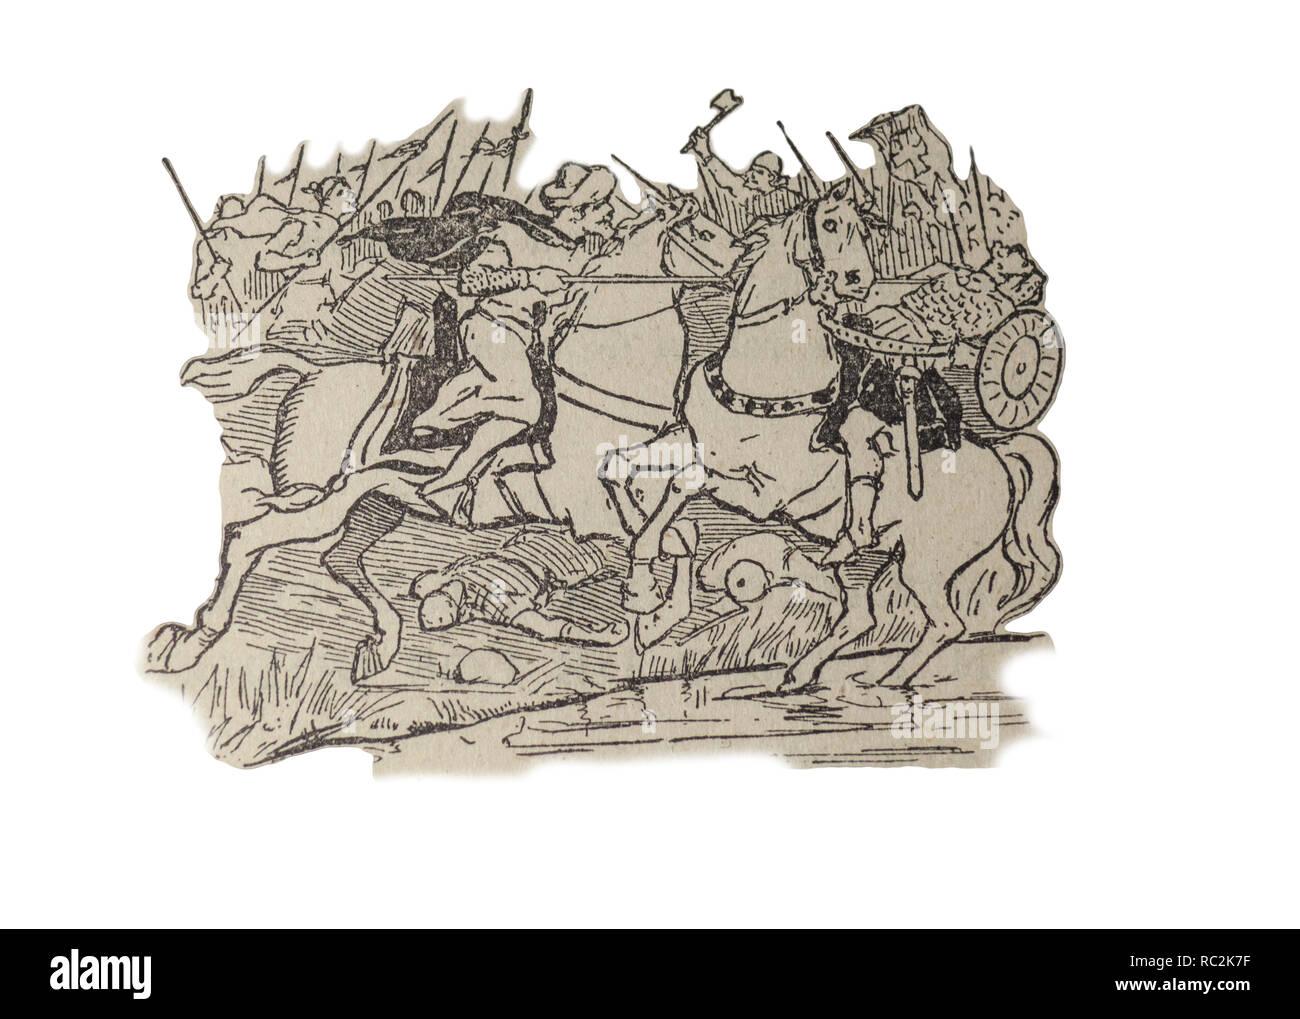 Badajoz, Spain - Jan 7th, 2019:  Battle of Guadalete in 711 between Visigoths of Hispania and Muslim Umayyad Caliphate. Draw from book Enciclopedia Au - Stock Image